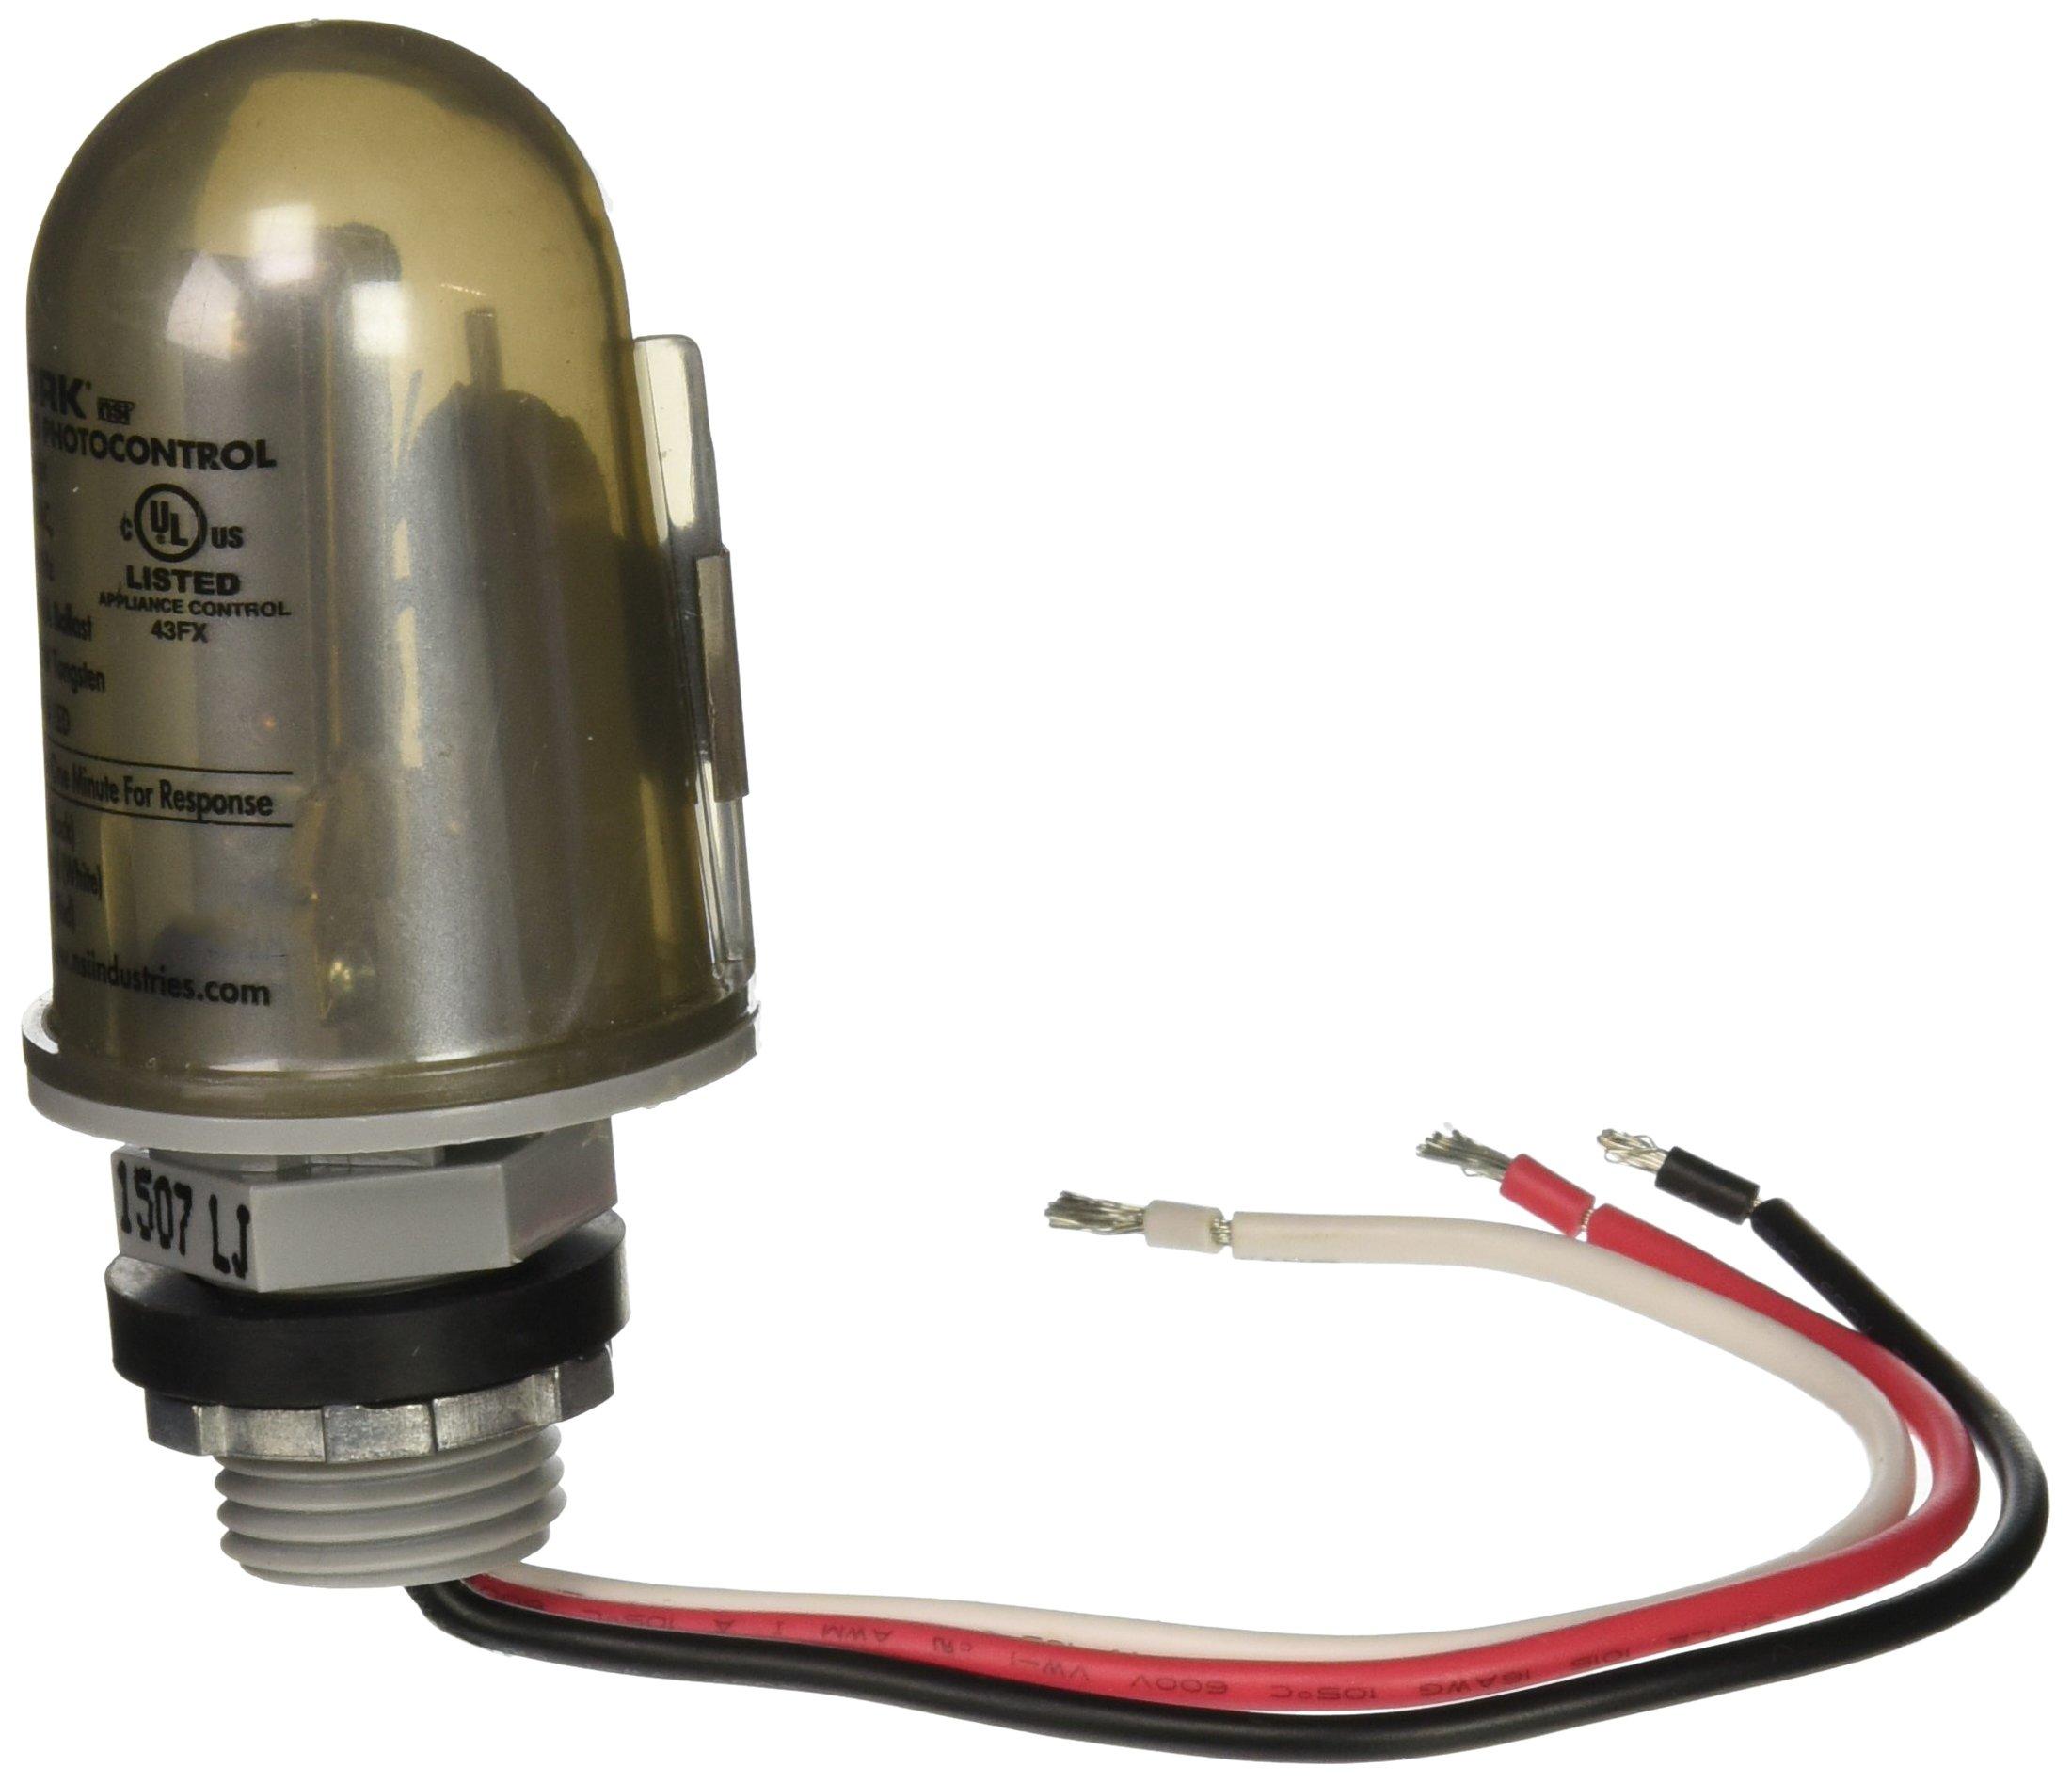 Tork Photo Electric Control Model 2000